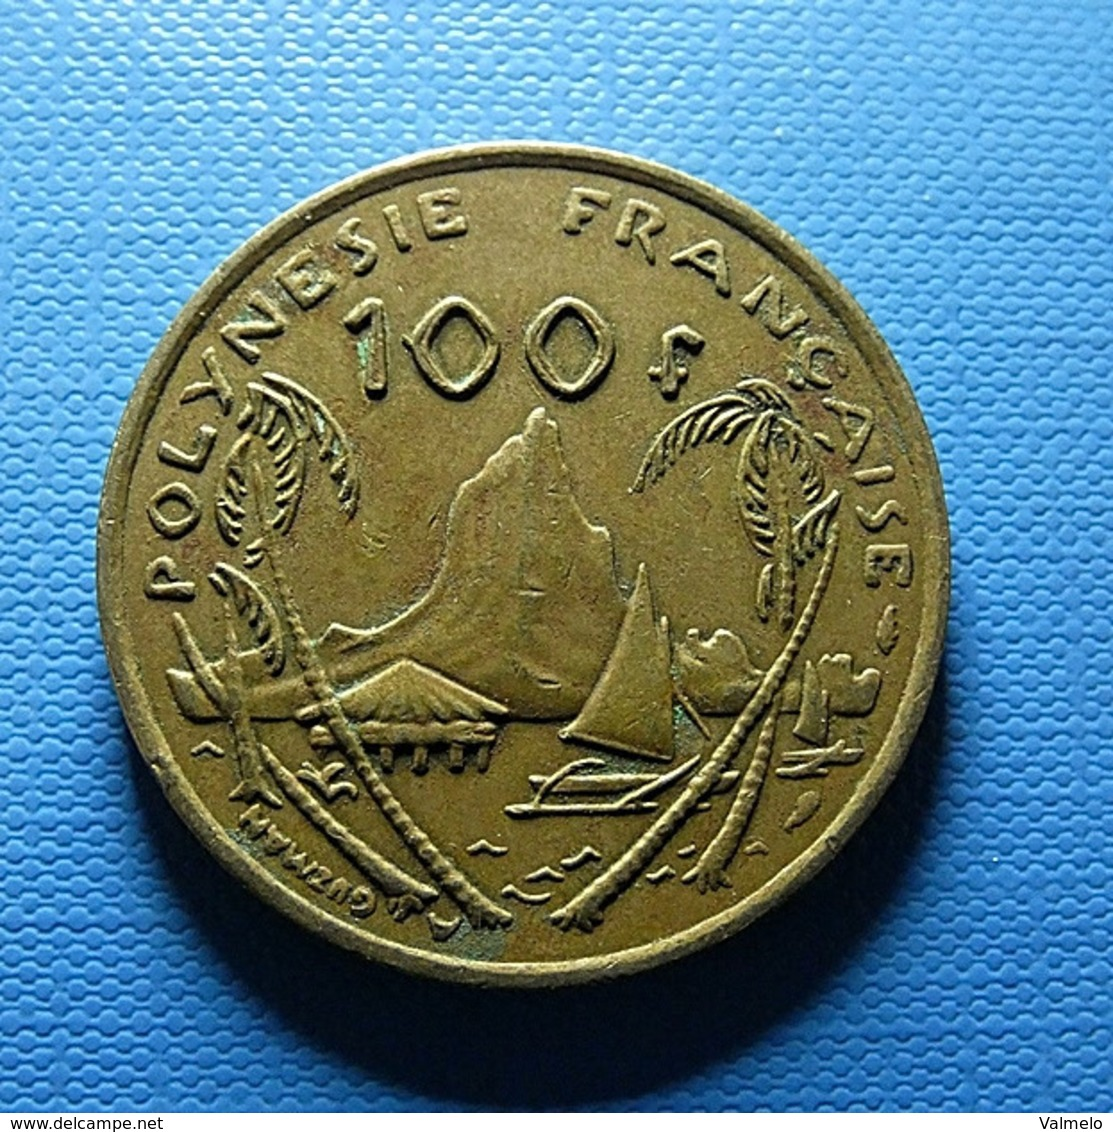 French Polynesia 100 Francs 1976 - Französisch-Polynesien